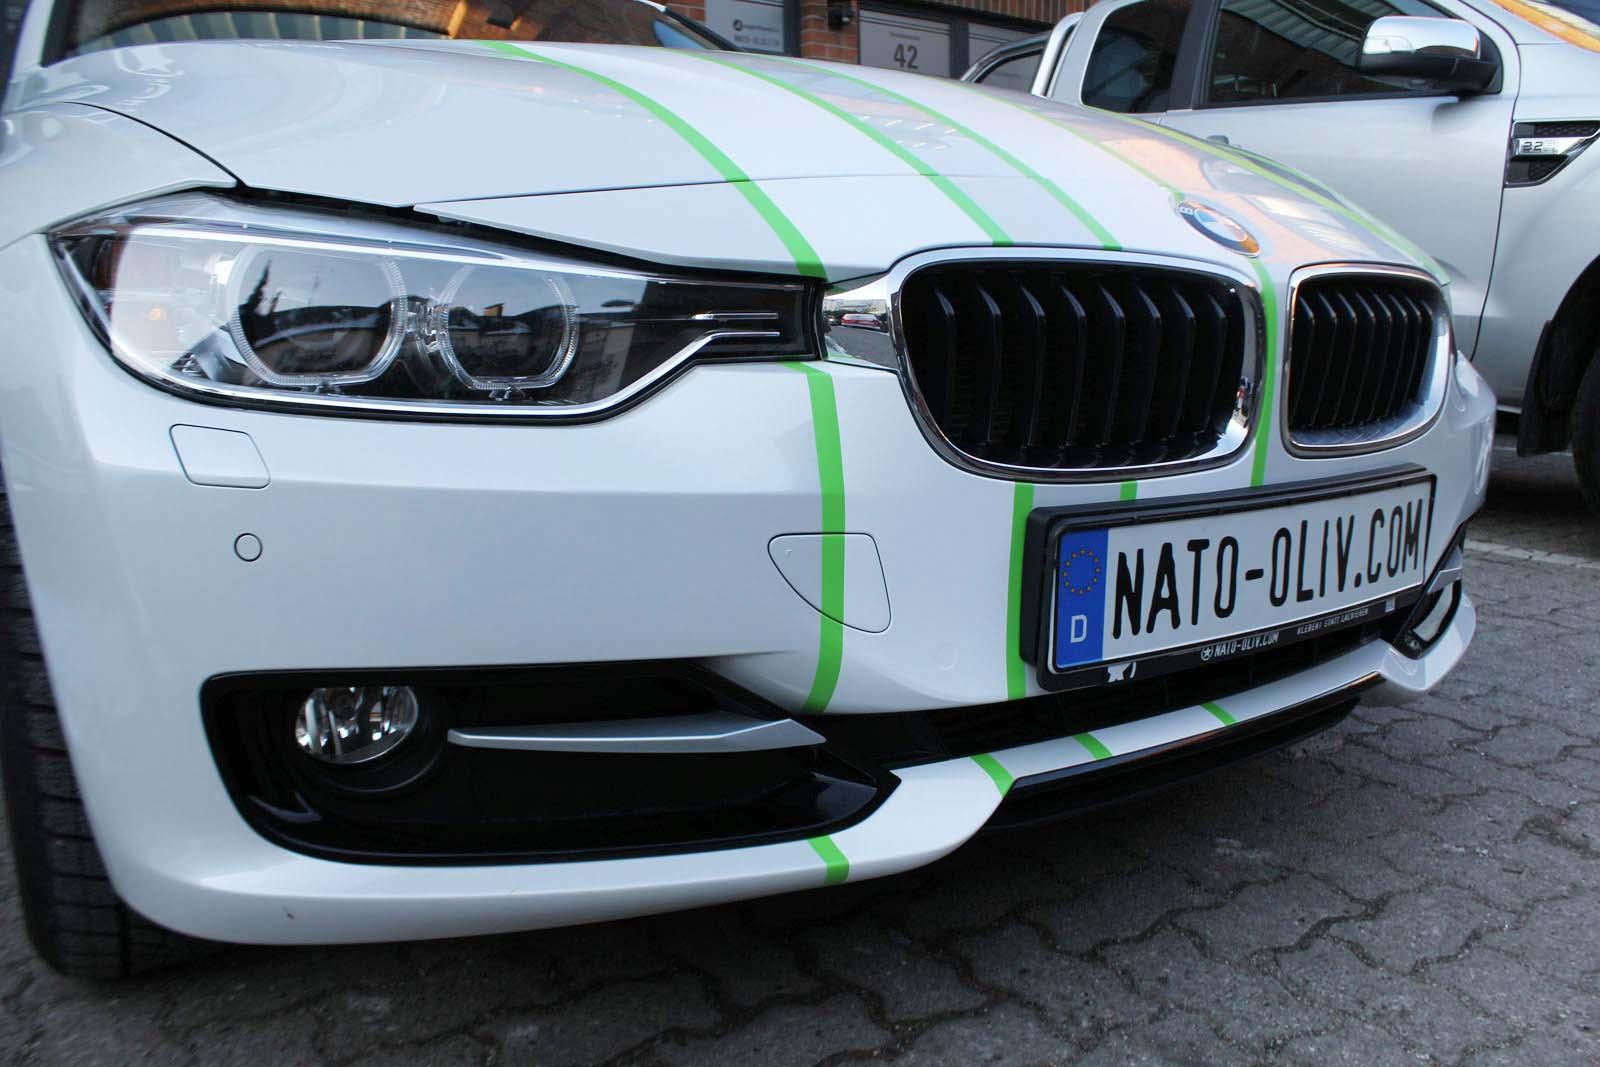 BMW_3ER_RALLYESTREIFEN_WEISS_GRUEN_MATT_MIT_BRANDING_17